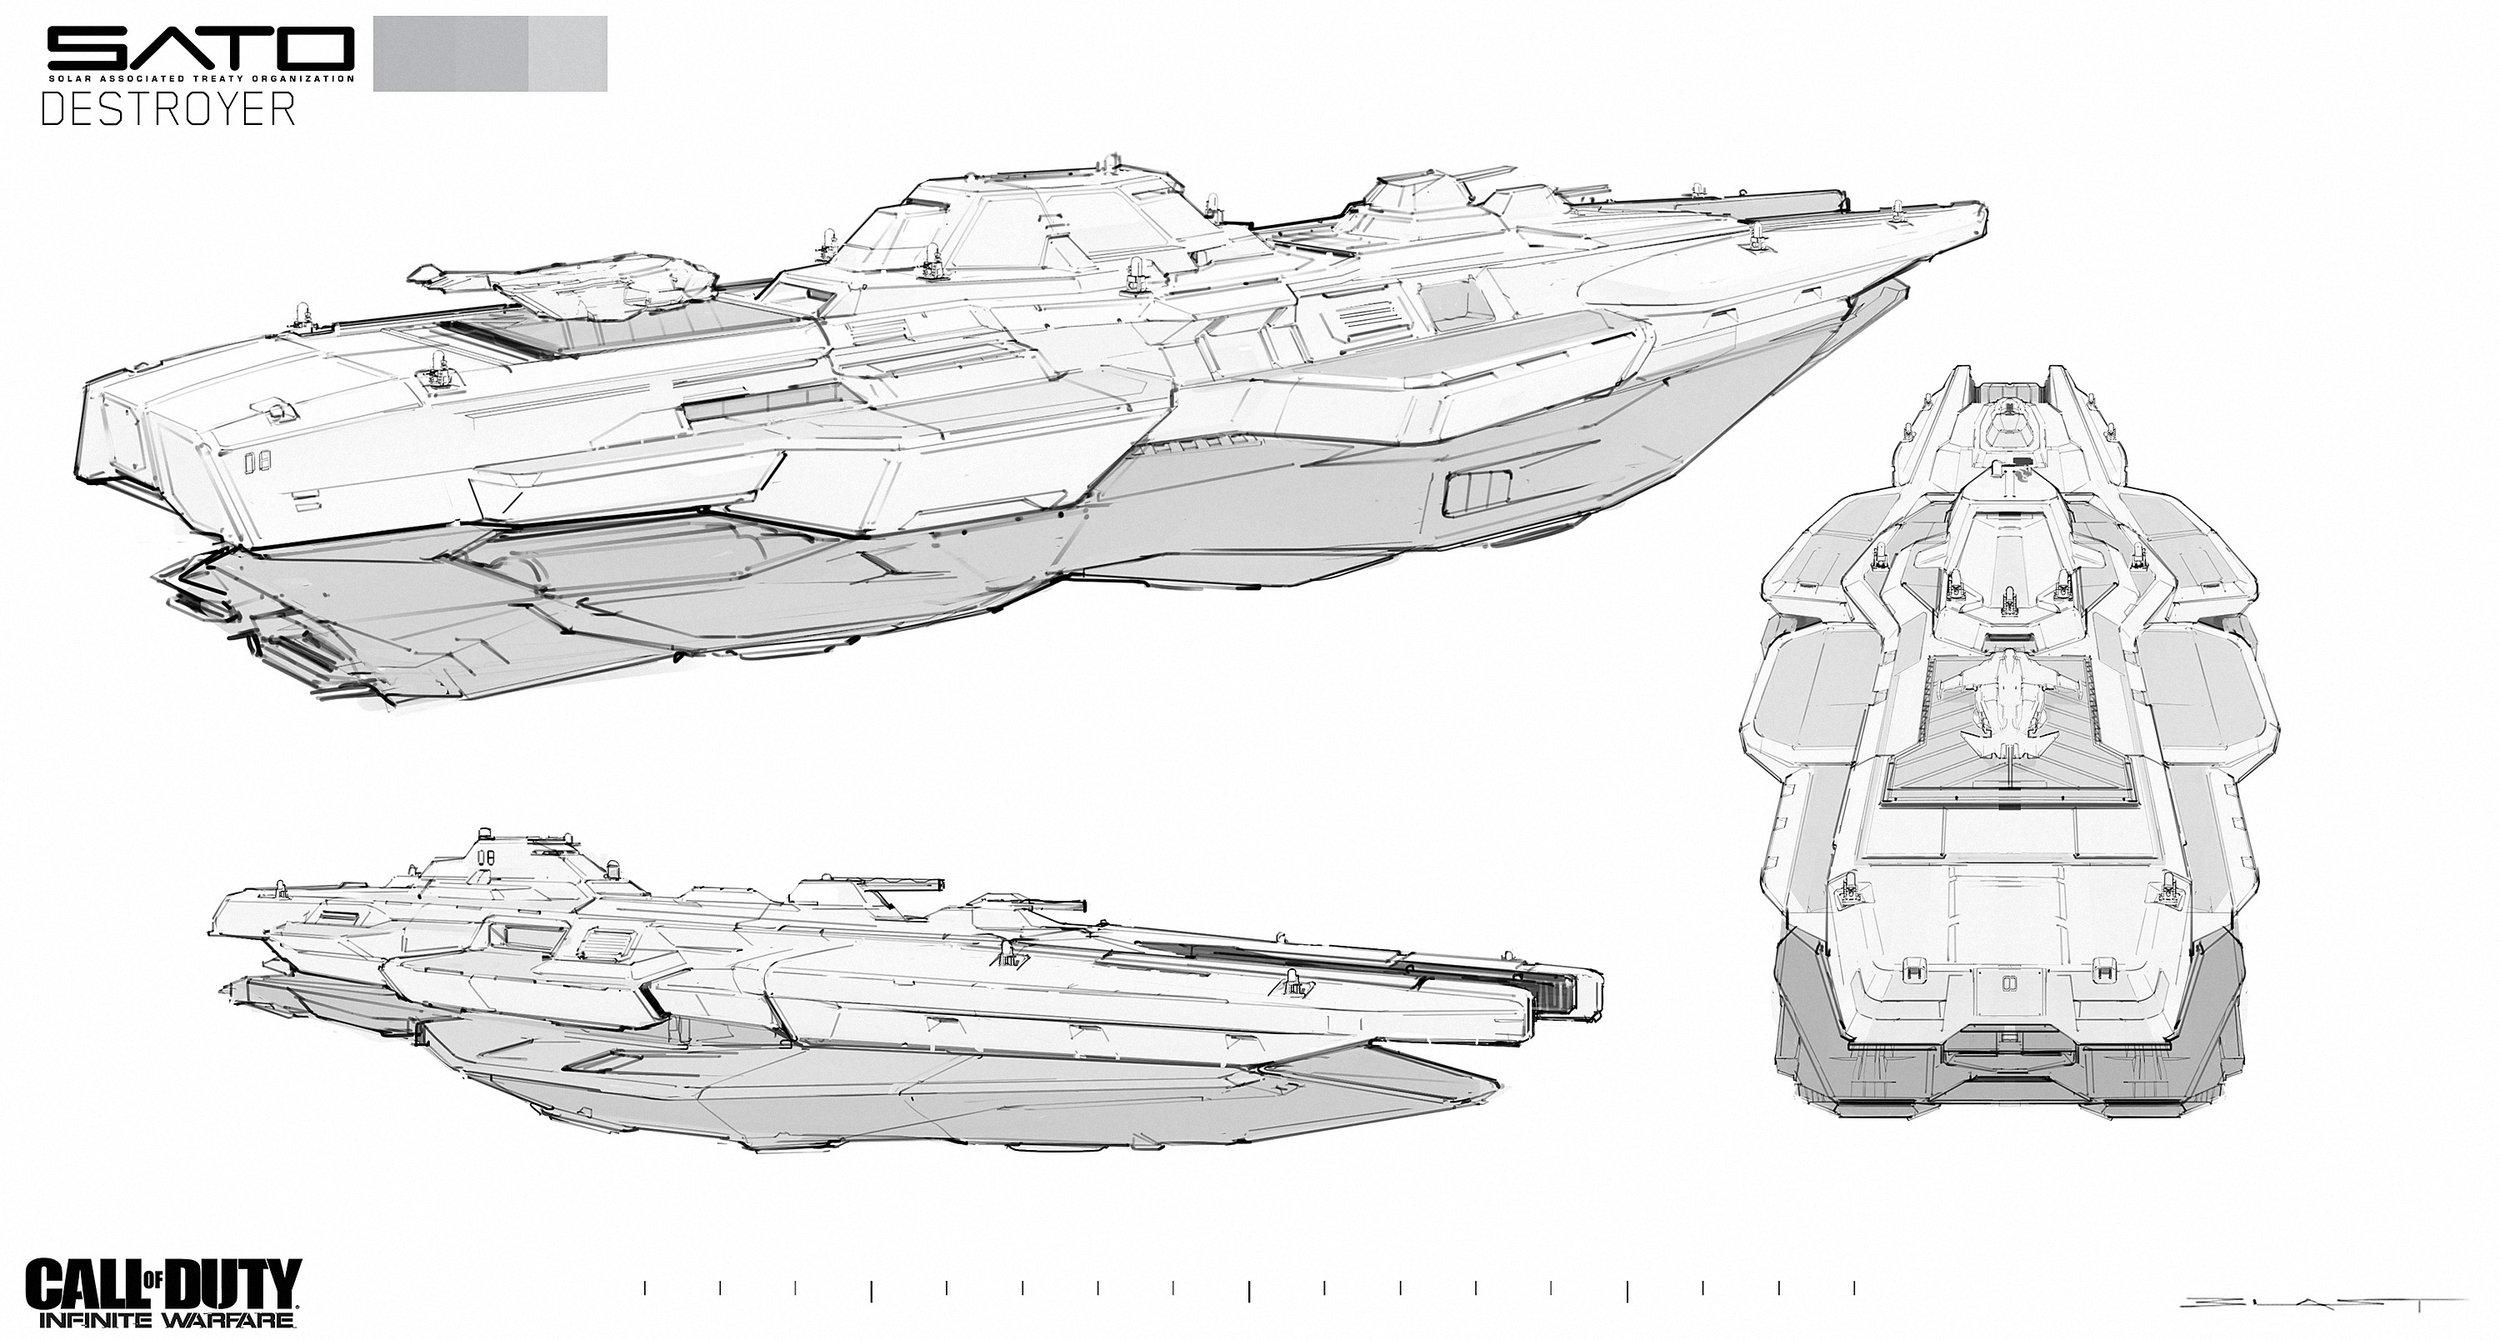 callofduty_benjaminlast_conceptdesign_sketch